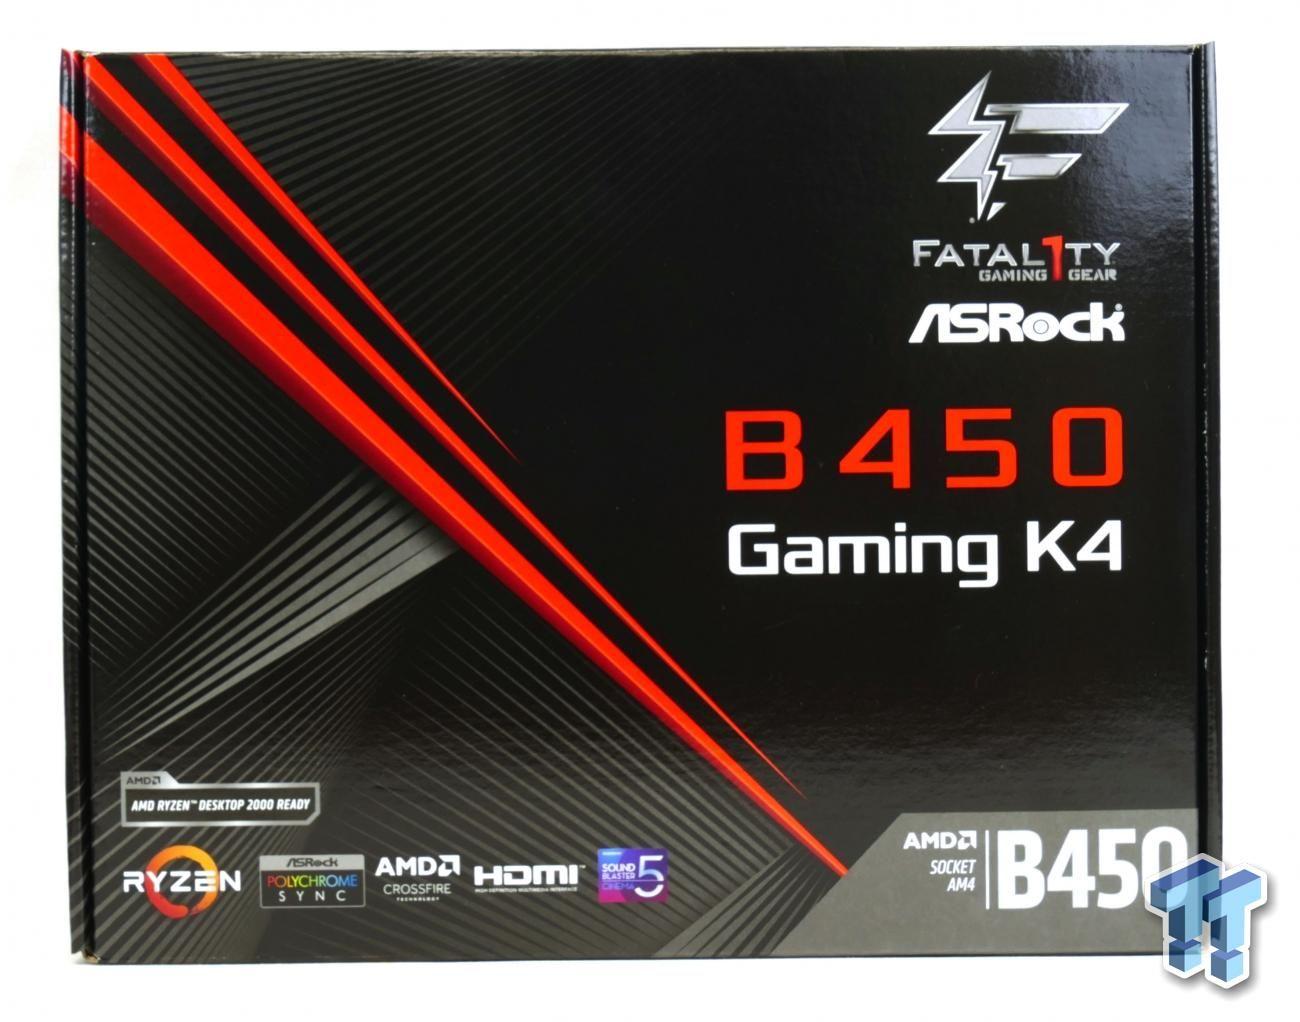 ASRock Fatal1ty B450 Gaming K4 (AMD B450) Motherboard Review